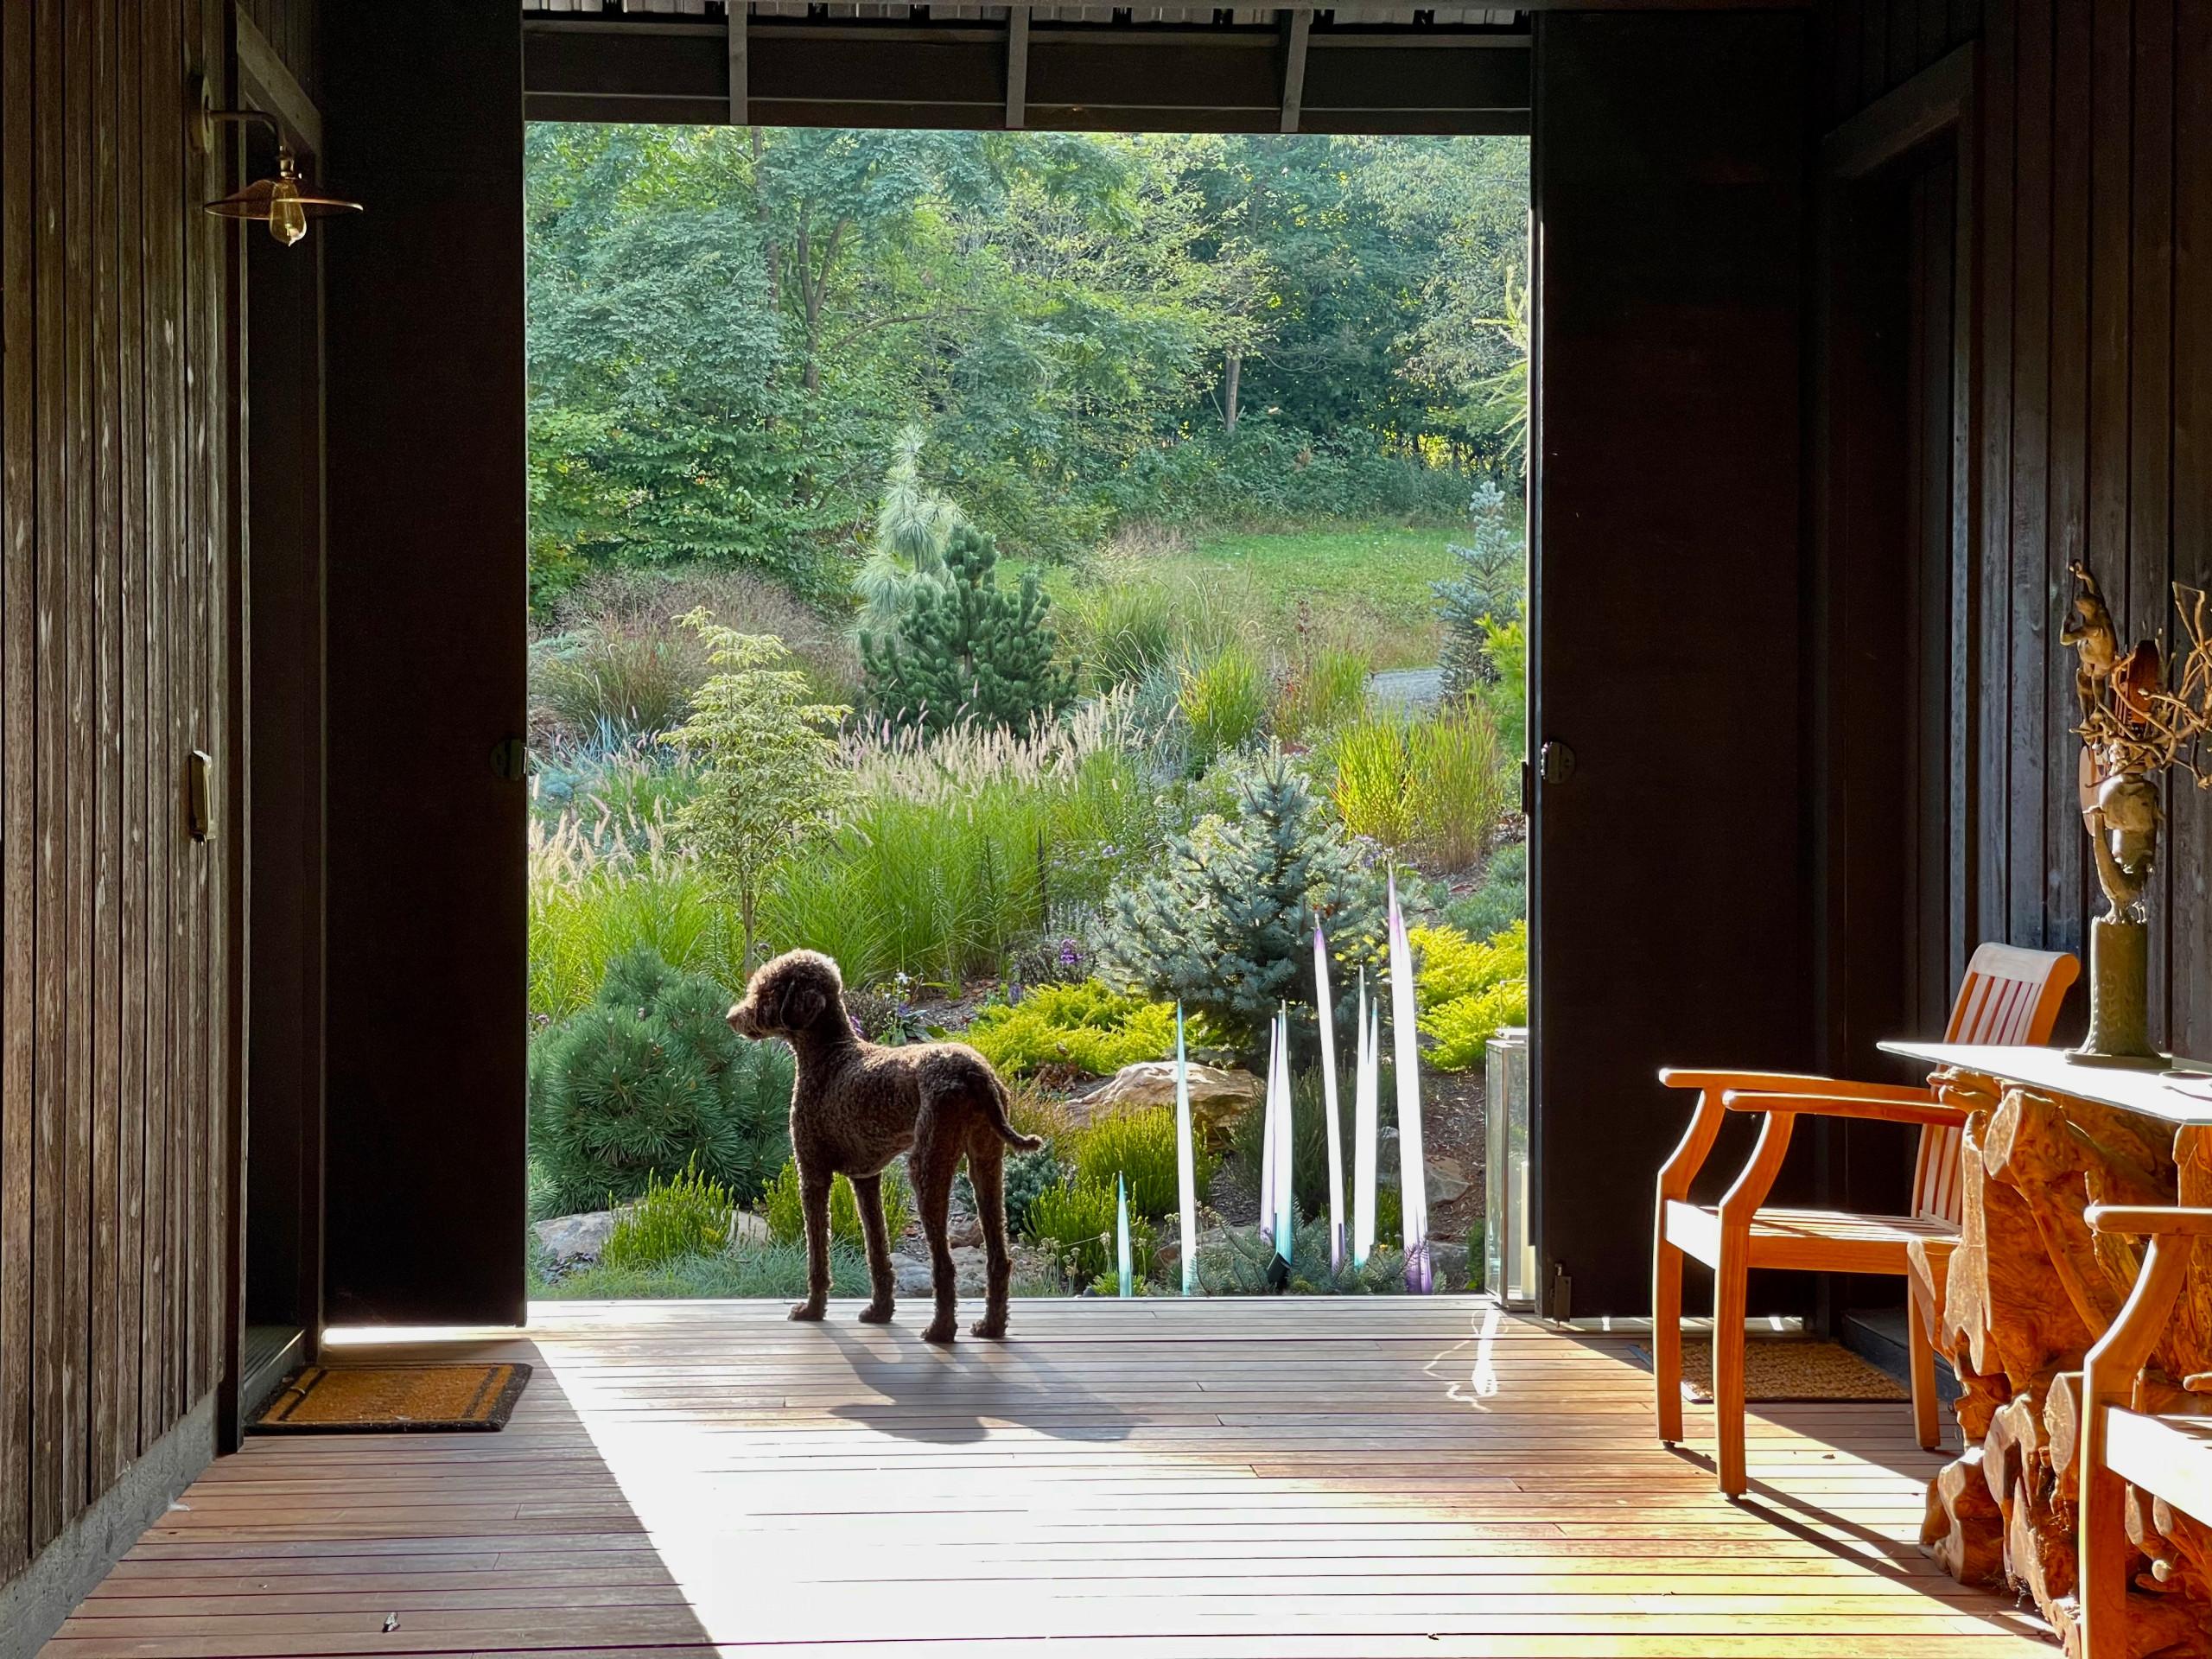 Dog Meets Dogtrot:  Sonoma Surveying the Garden